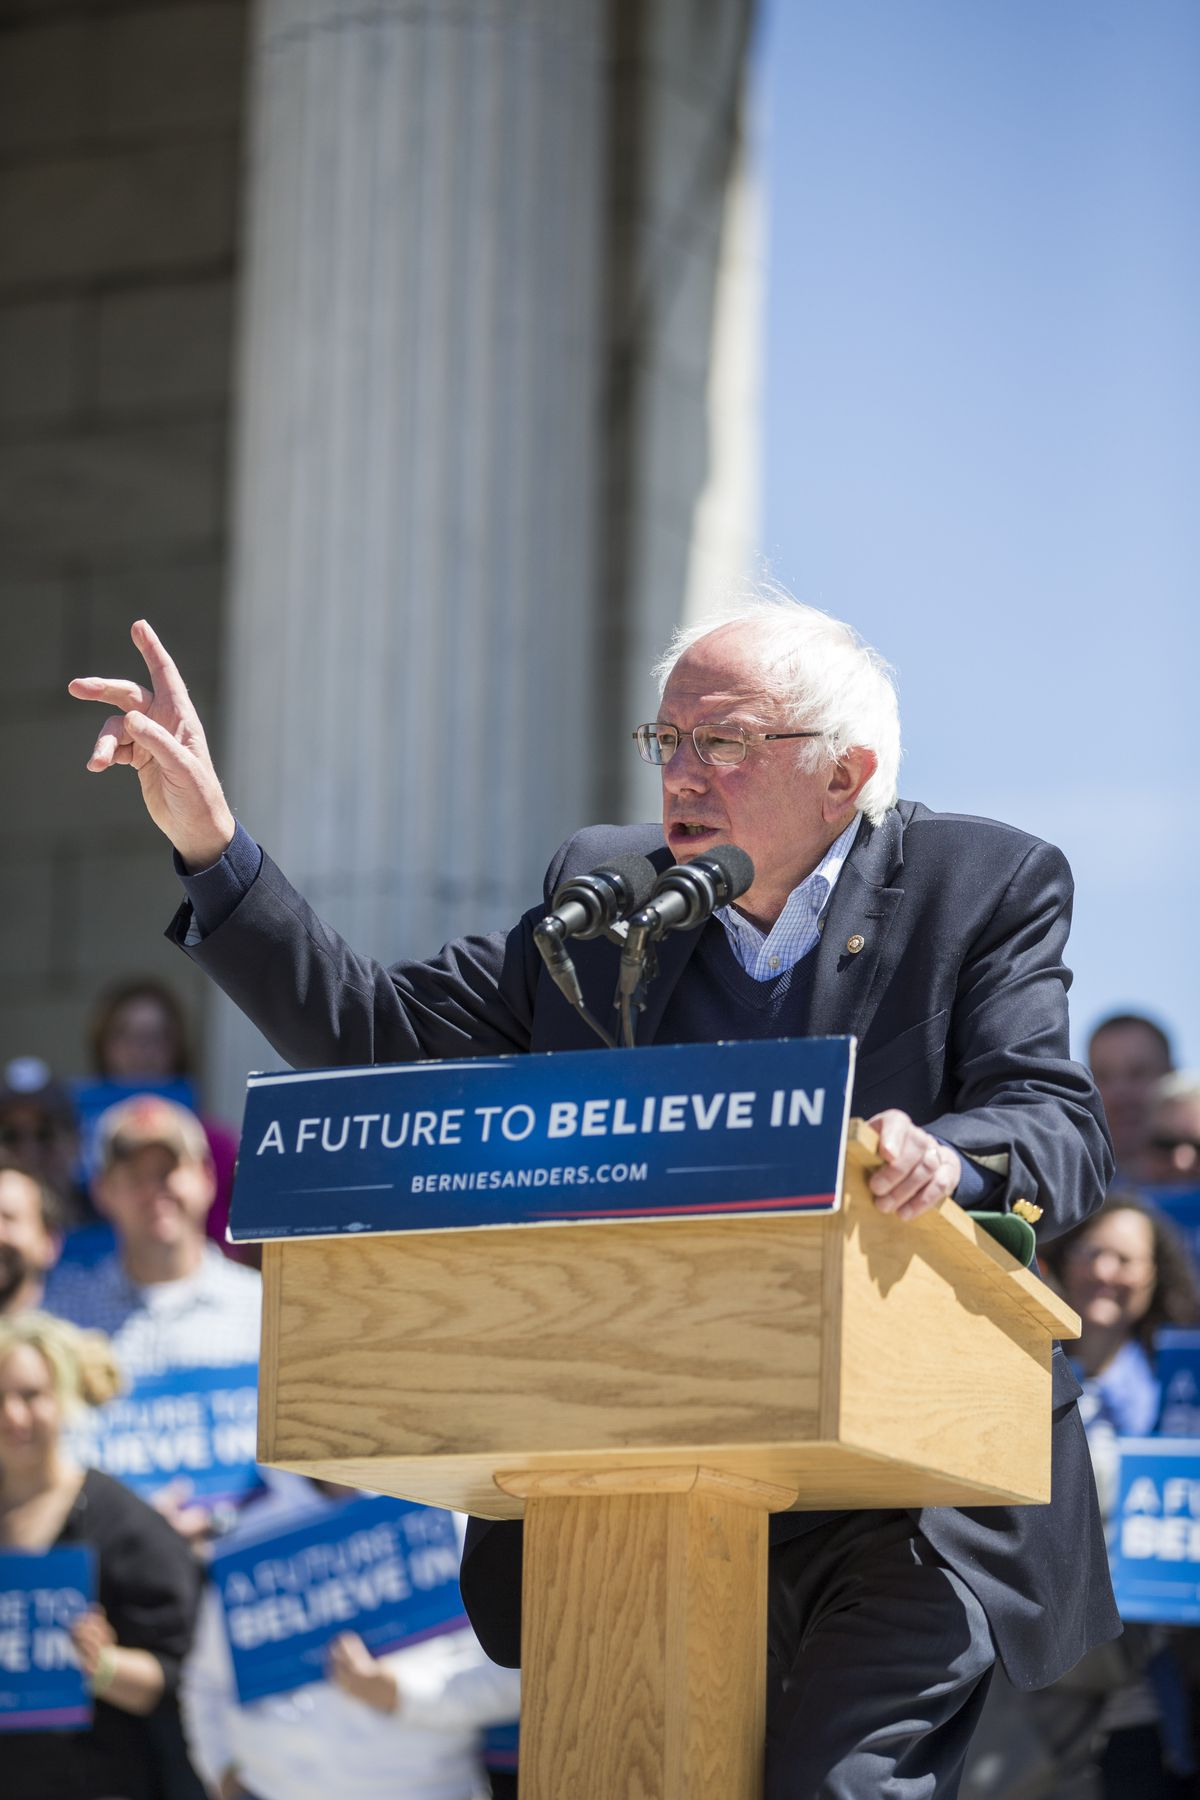 Bernie Sanders wearing a suit a rally